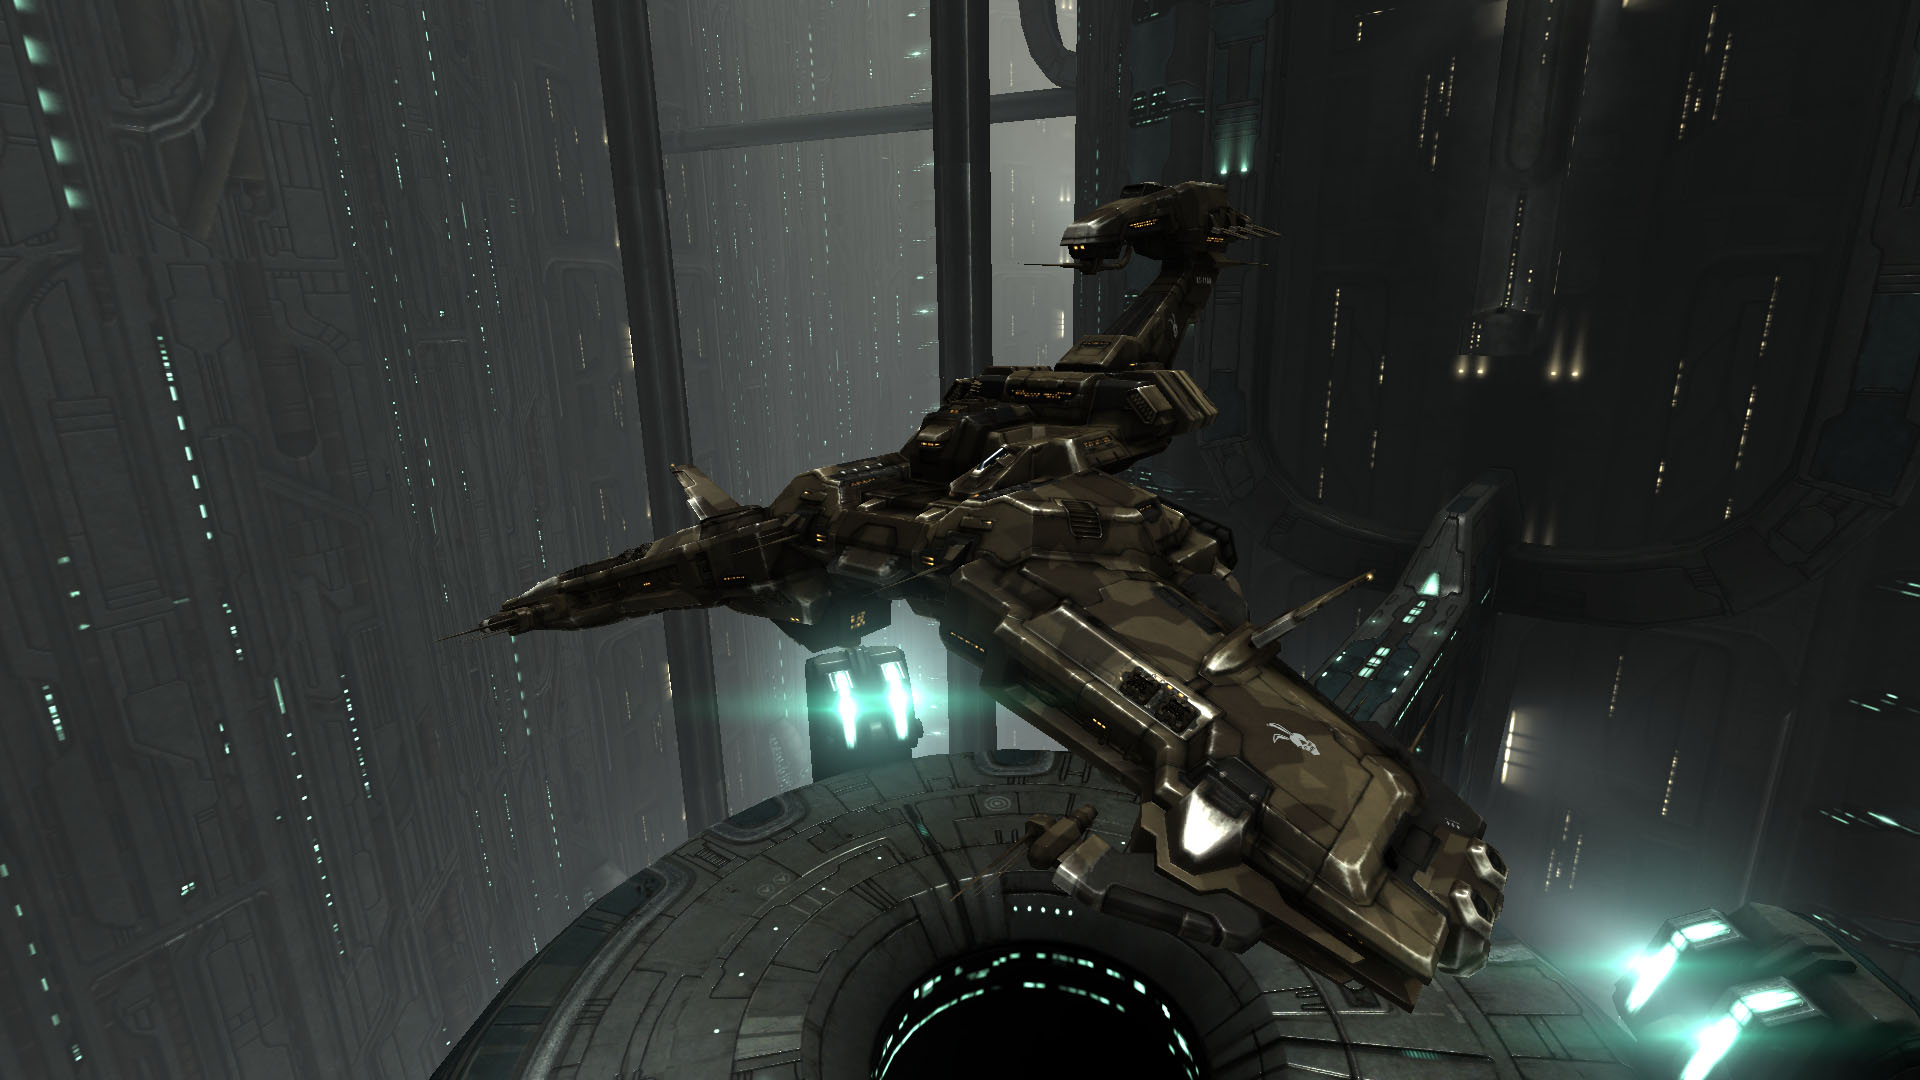 The beautiful and impressive Gurista Rattlesnake battleship